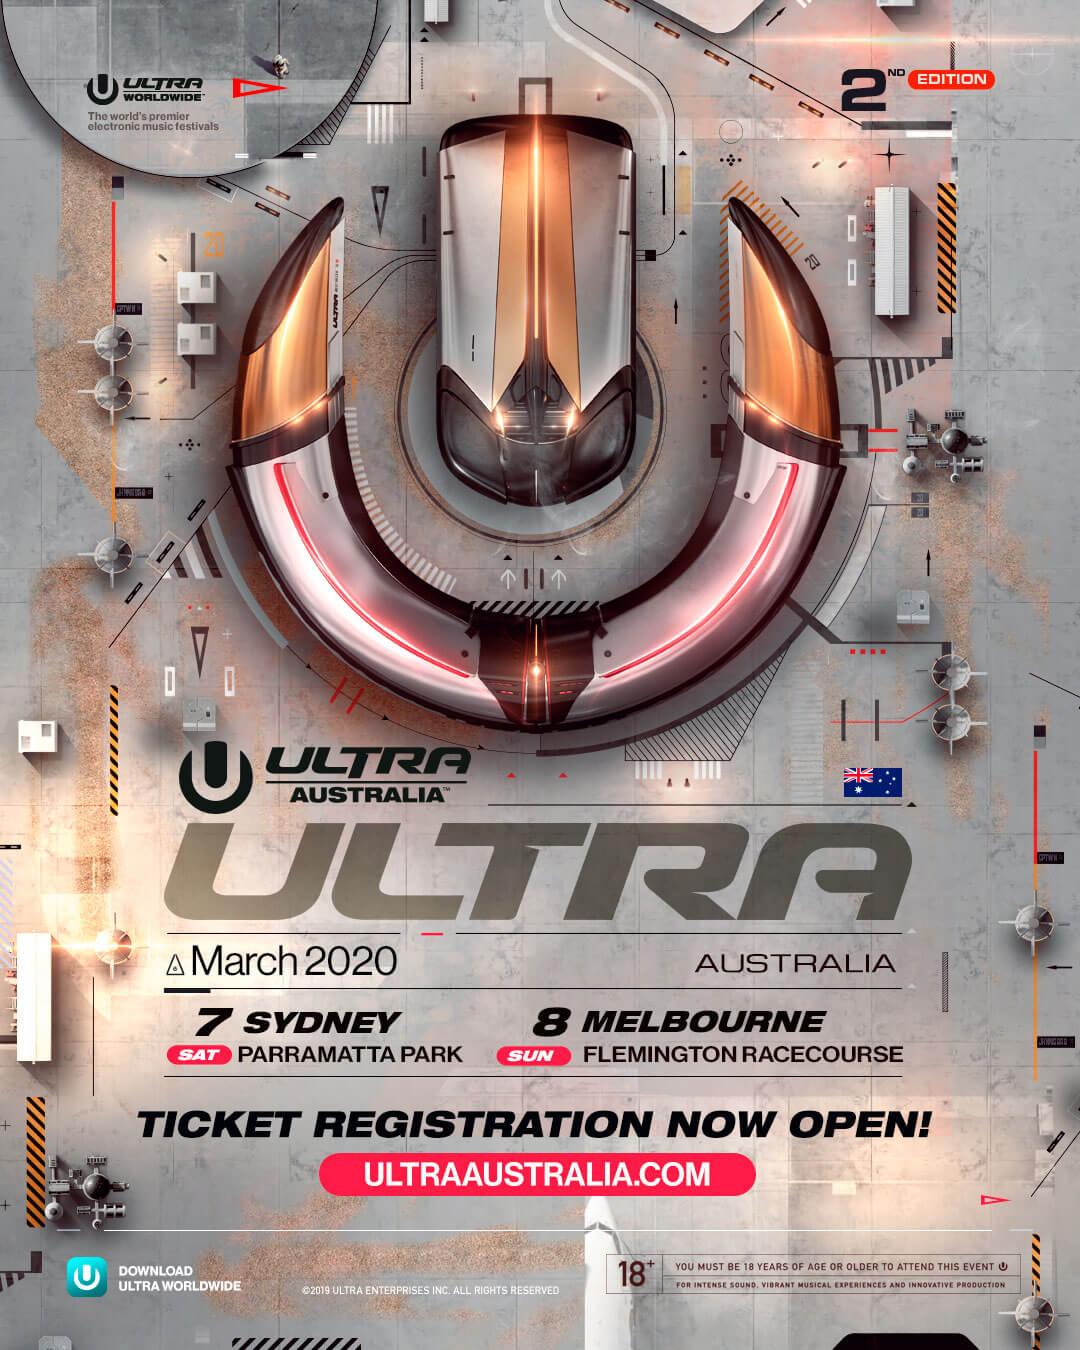 ULTRA Australia to Return in March 2020